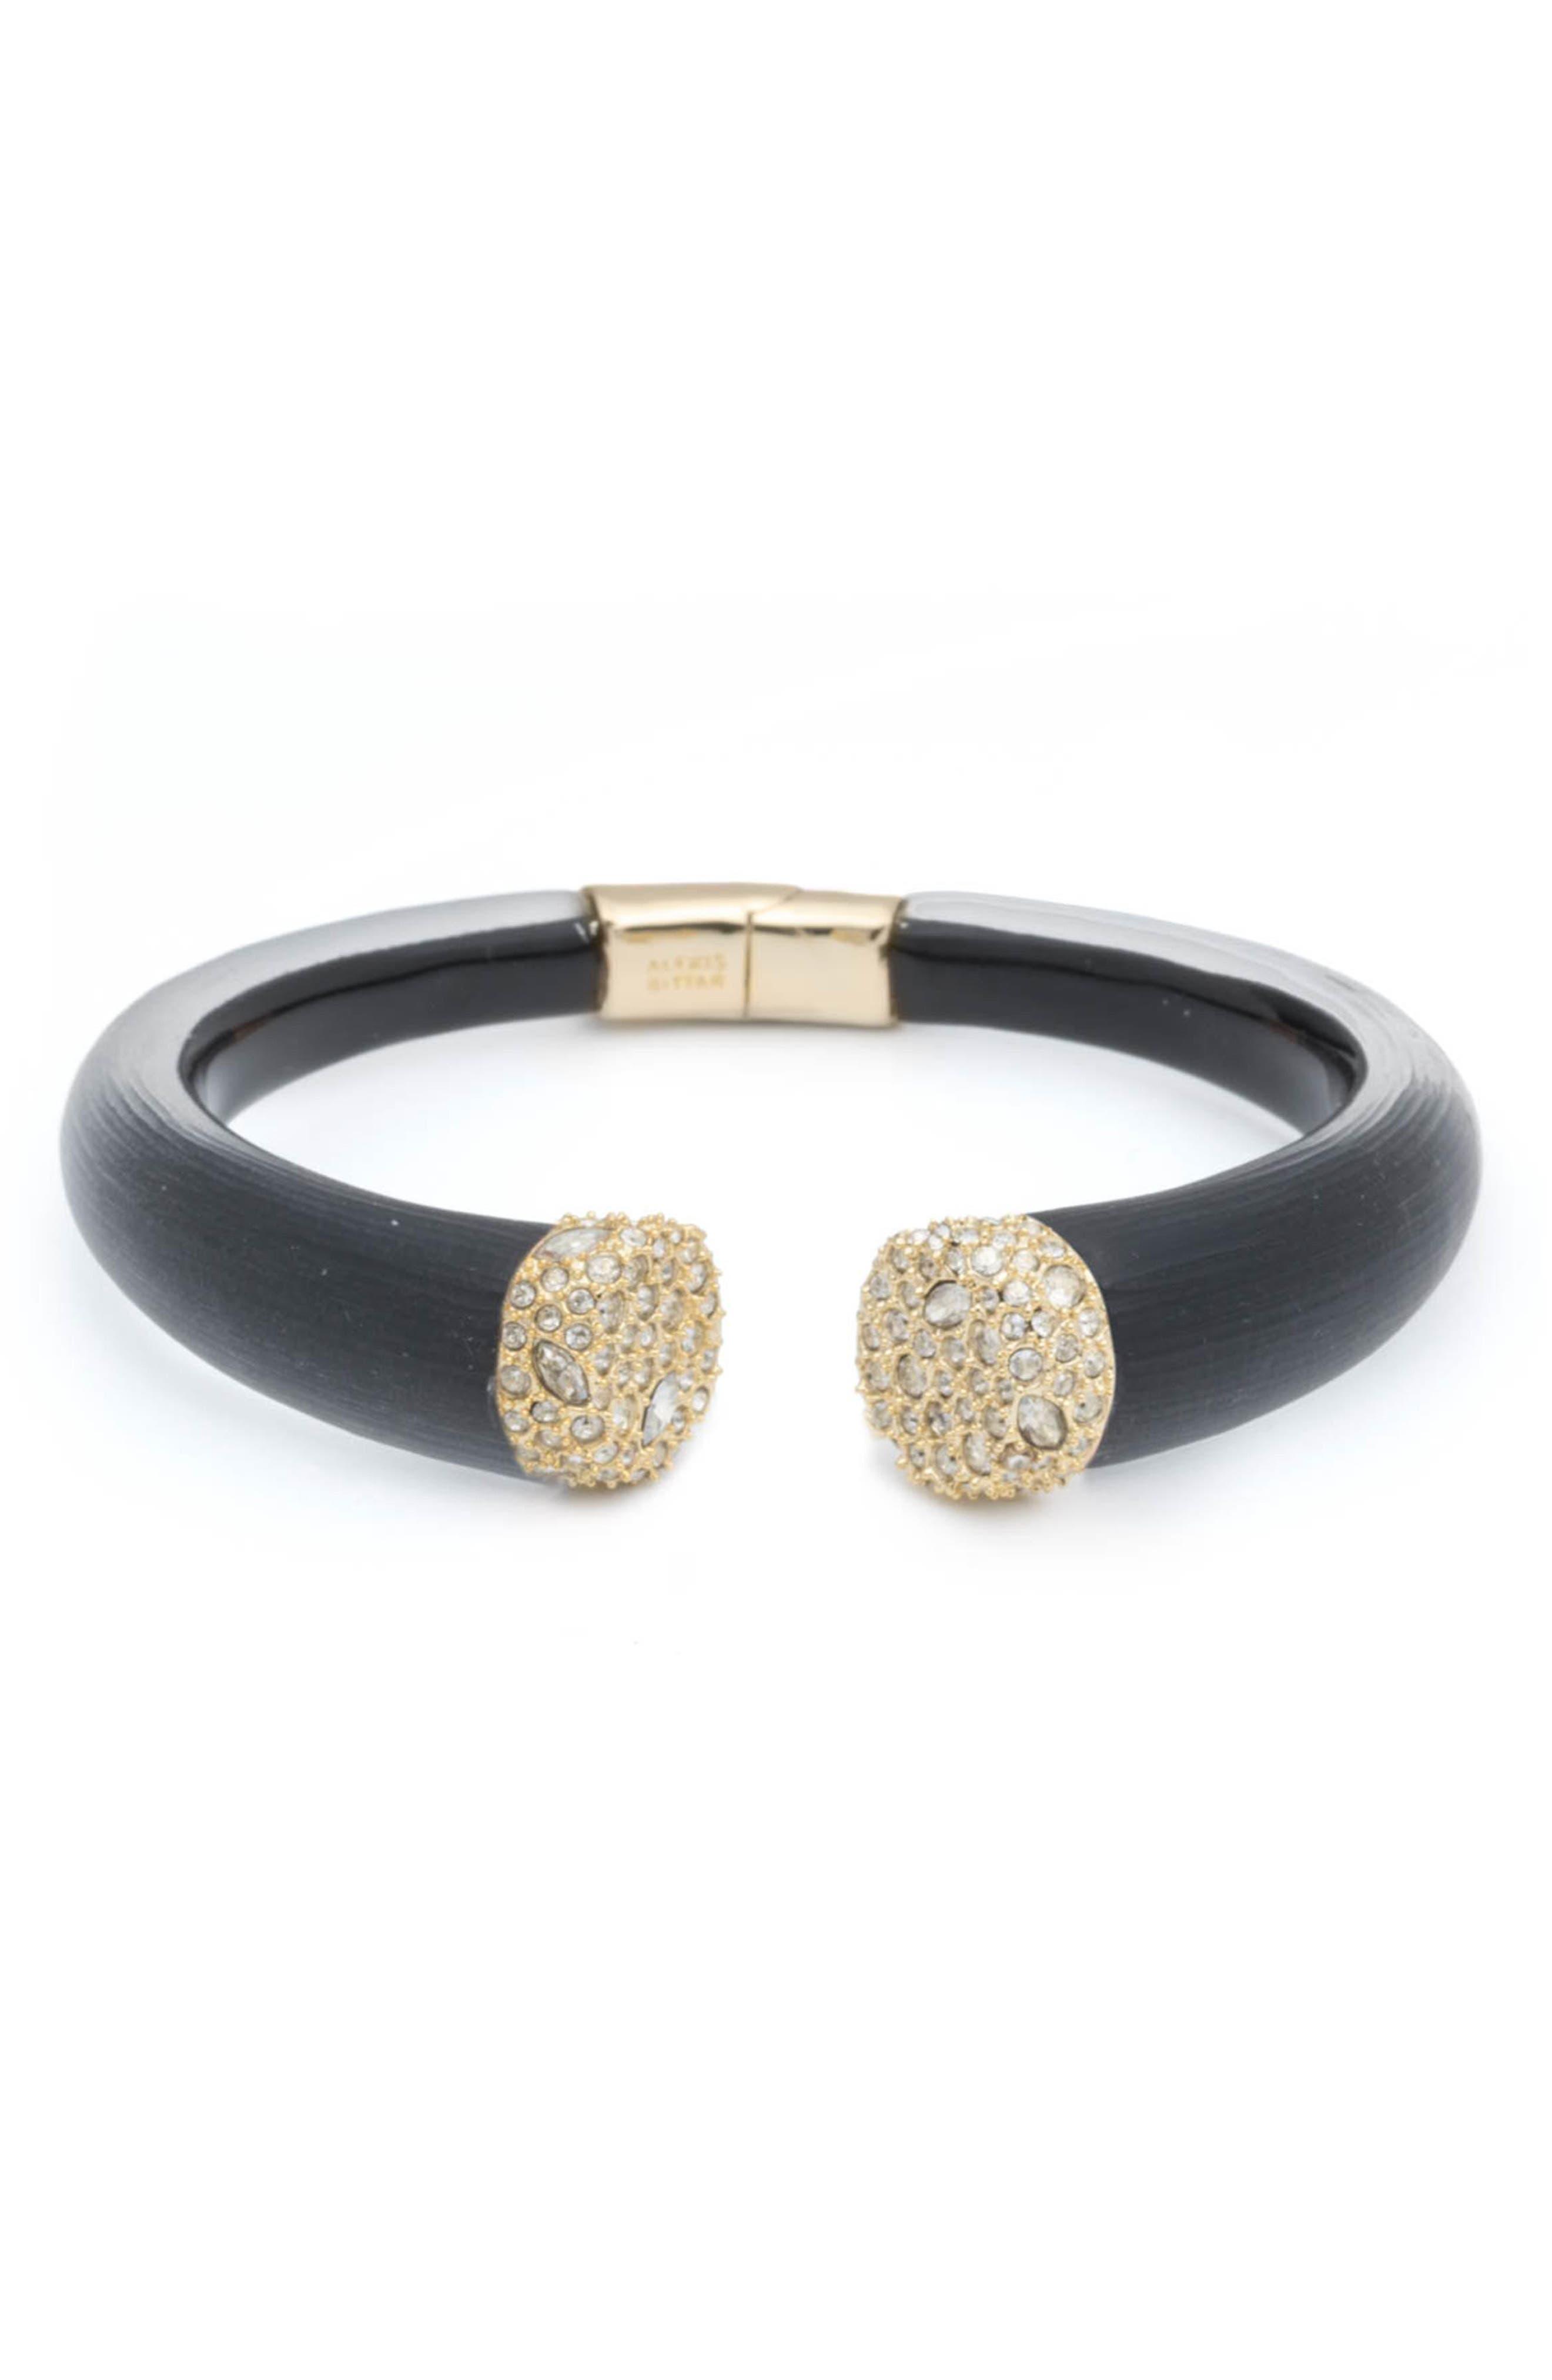 ALEXIS BITTAR, Essentials Encrusted Pavé Hinged Bracelet, Main thumbnail 1, color, BLACK